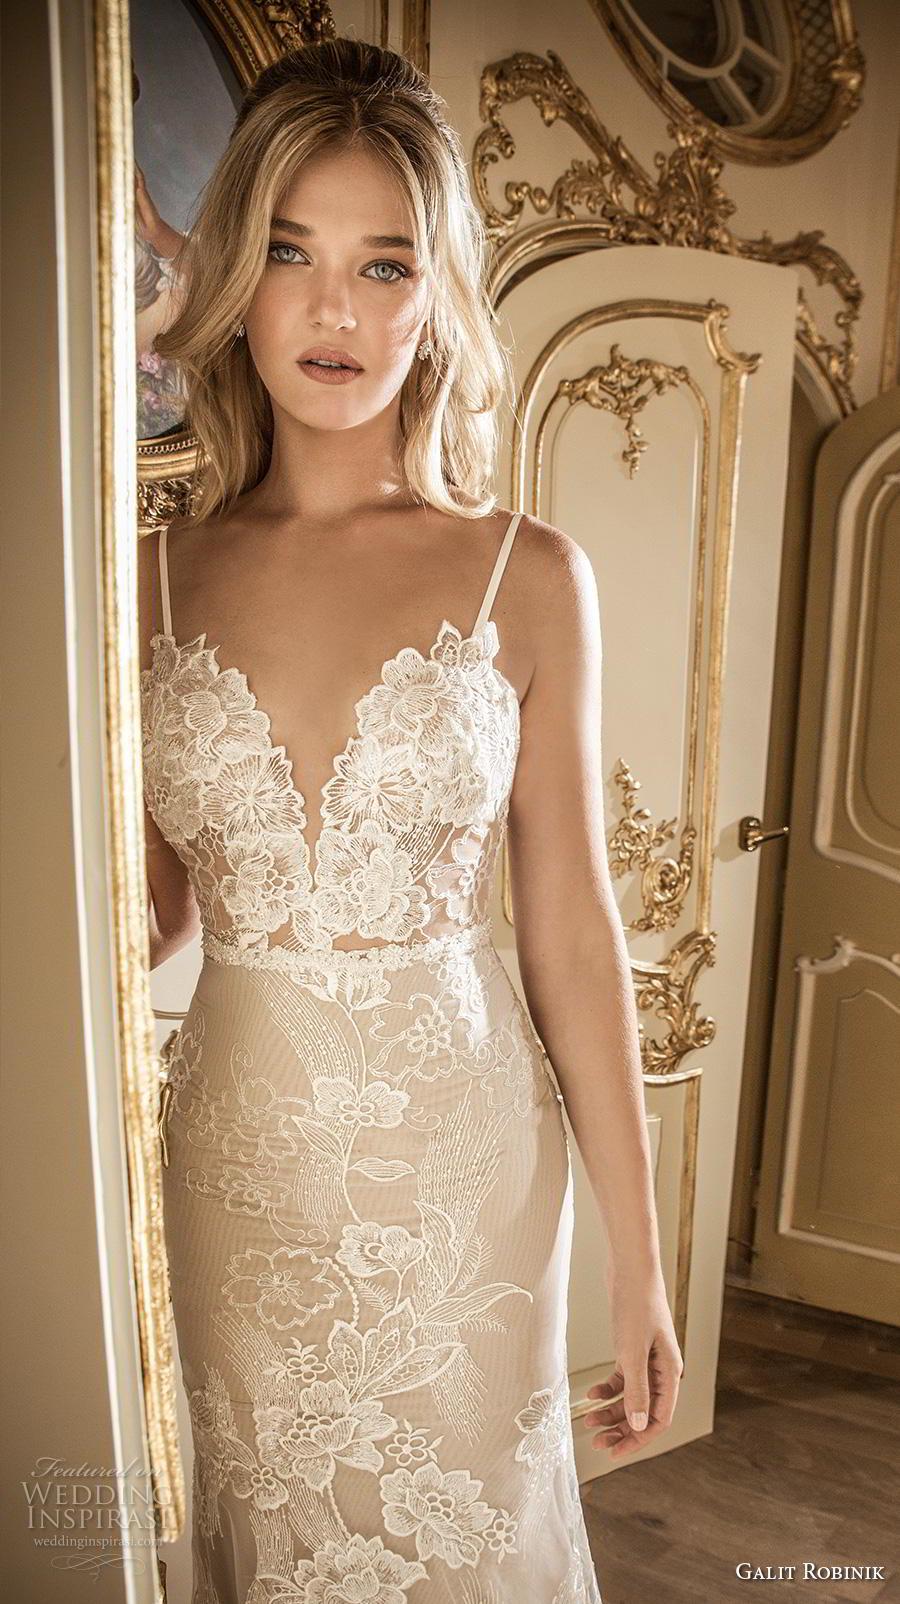 galit robinik 2019 bridal thin strap deep sweetheart neckline full embellishment elegant romantic fit and flare wedding dress backless chapel train (2) zv